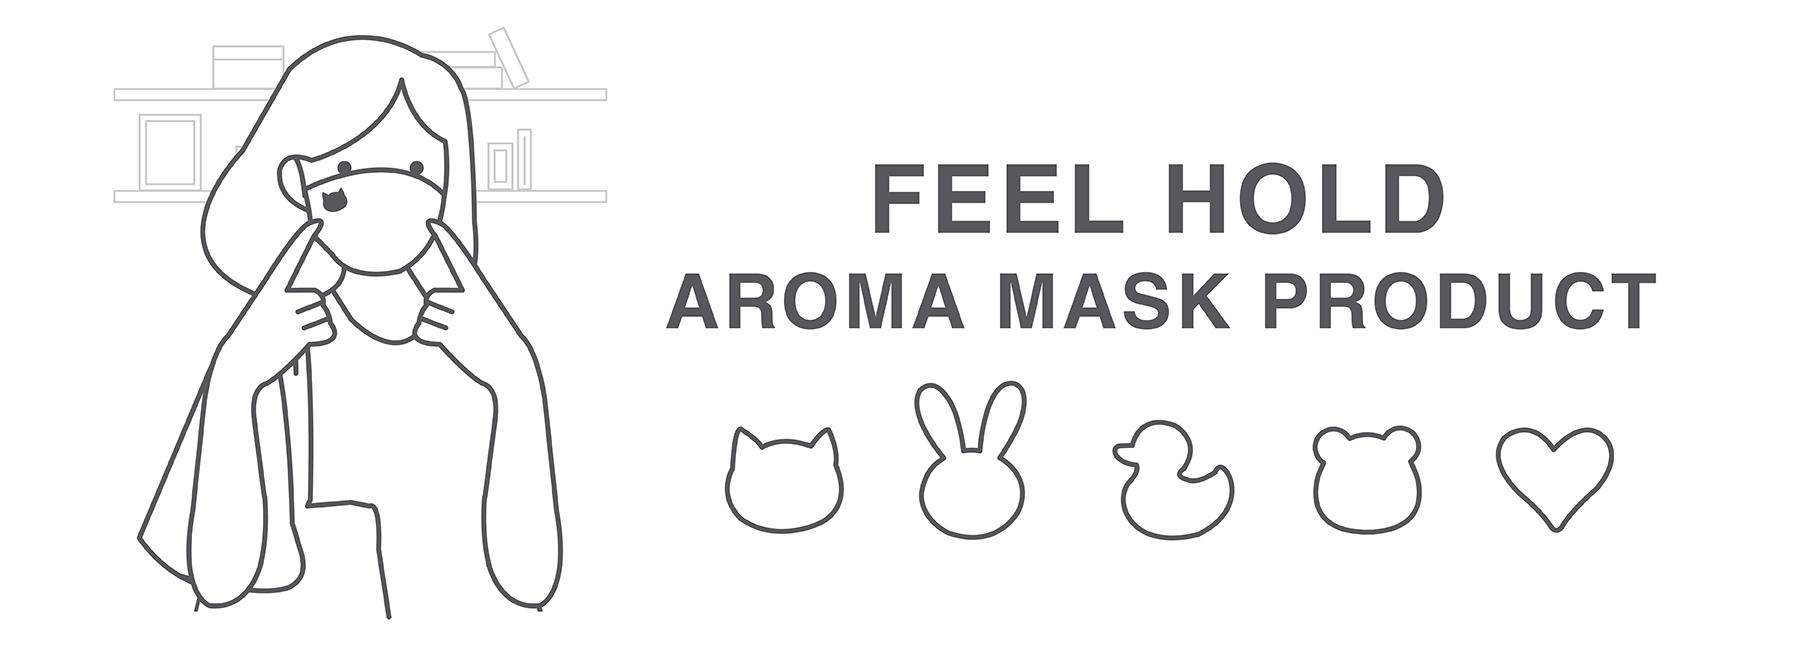 Aroma mask sticker feel hold g